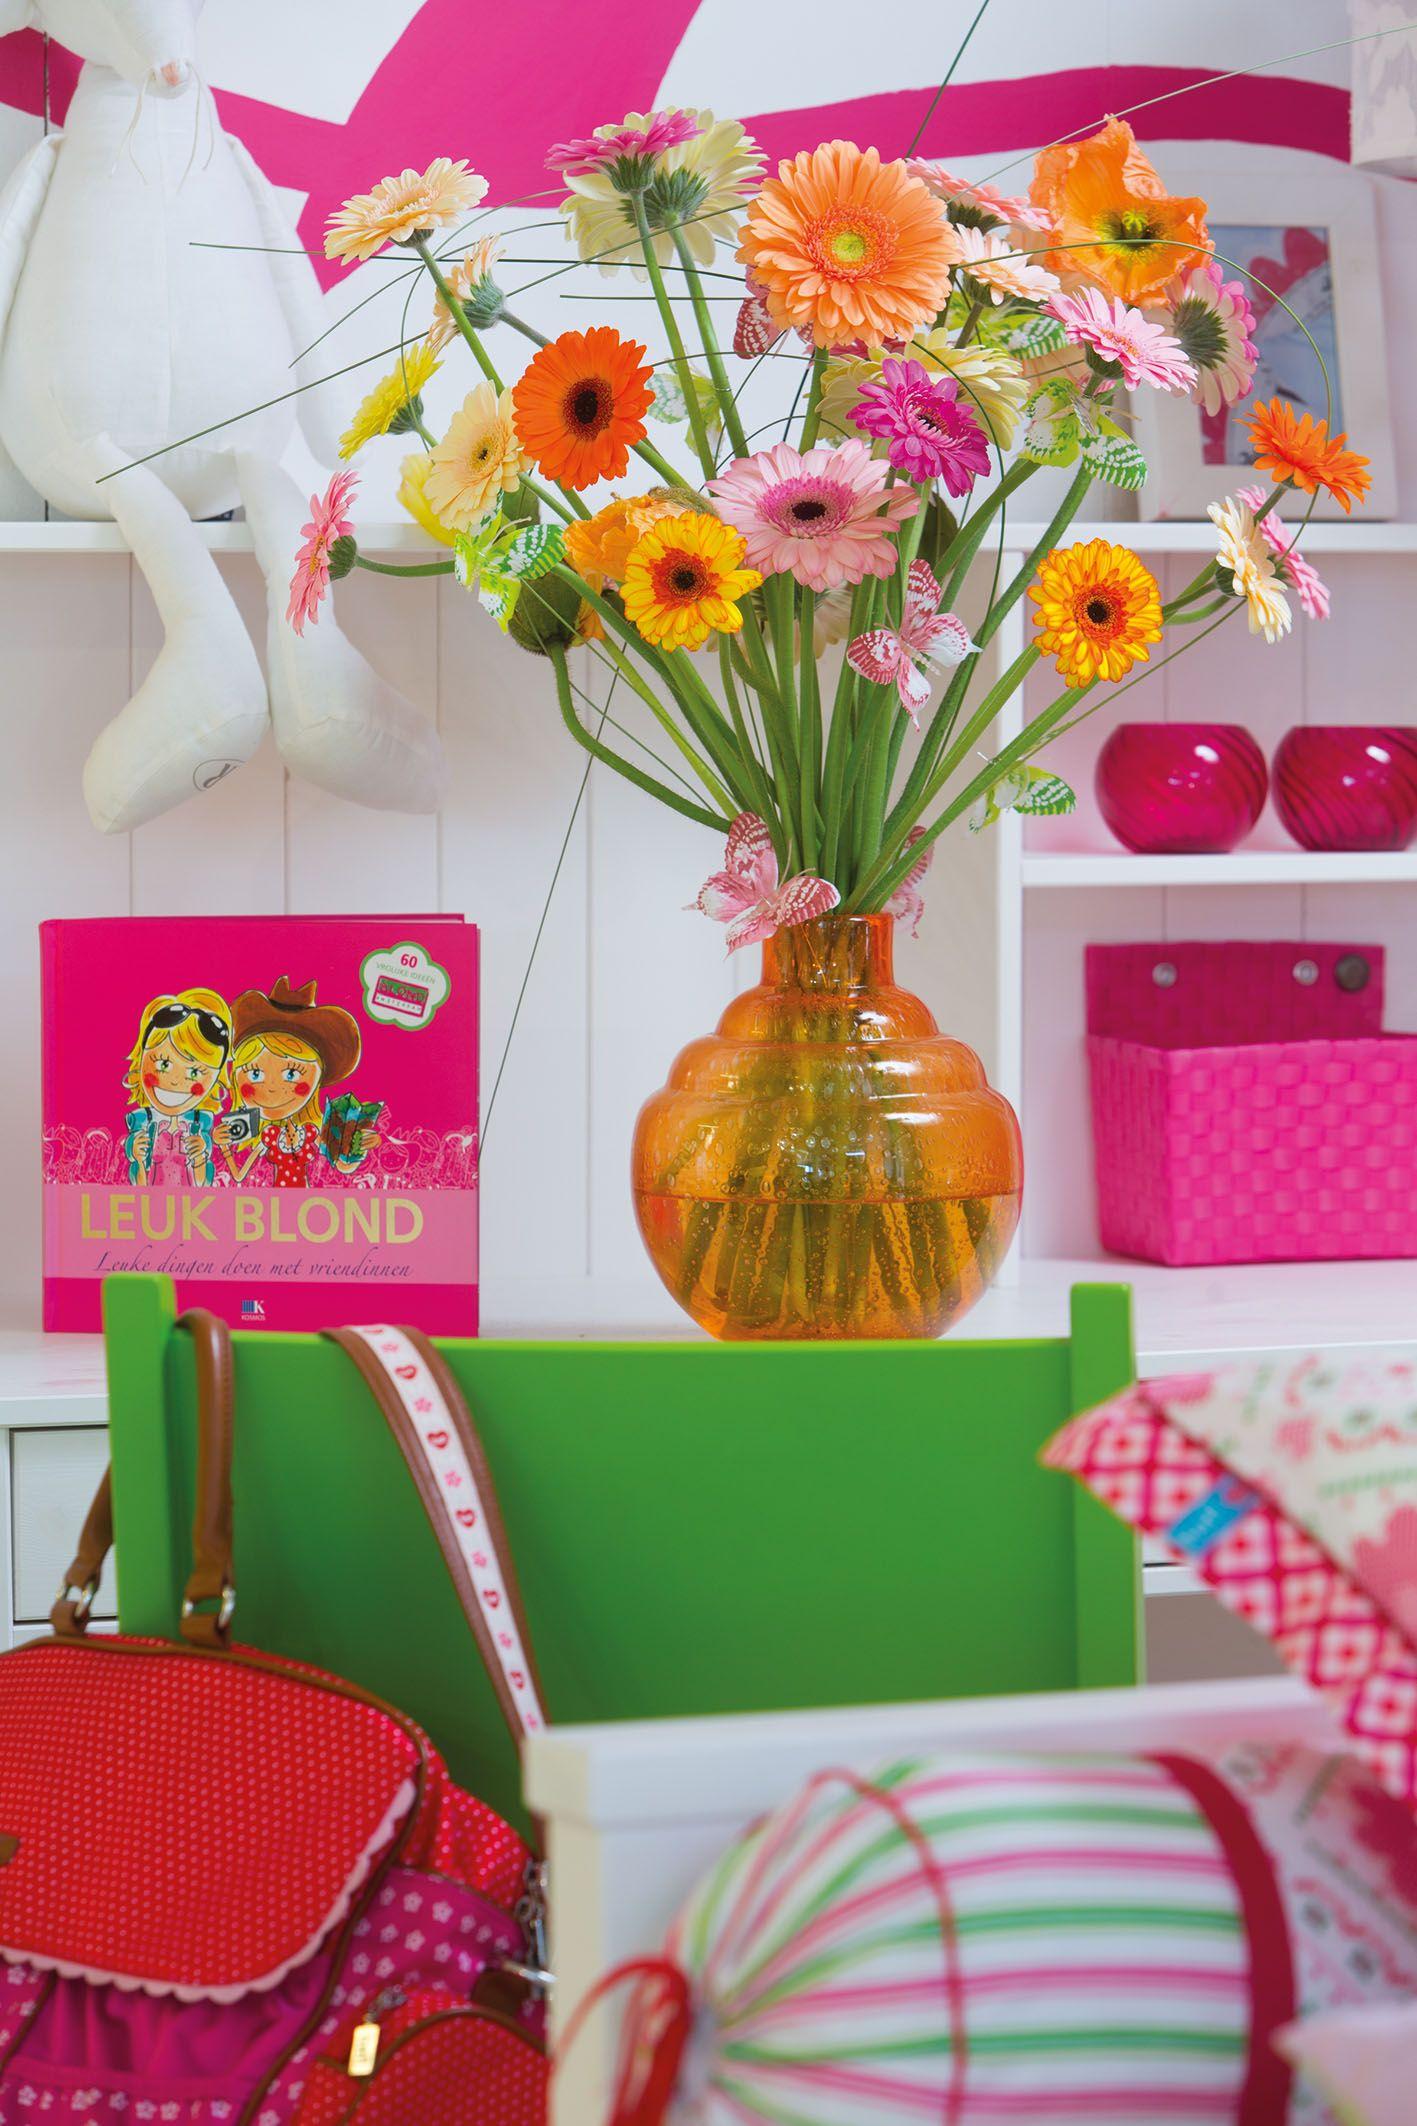 Colourful gerberas in an orange vase #pinkgerberas #orangegerberas #inspiration #colouredbygerbera #dutchgerbera